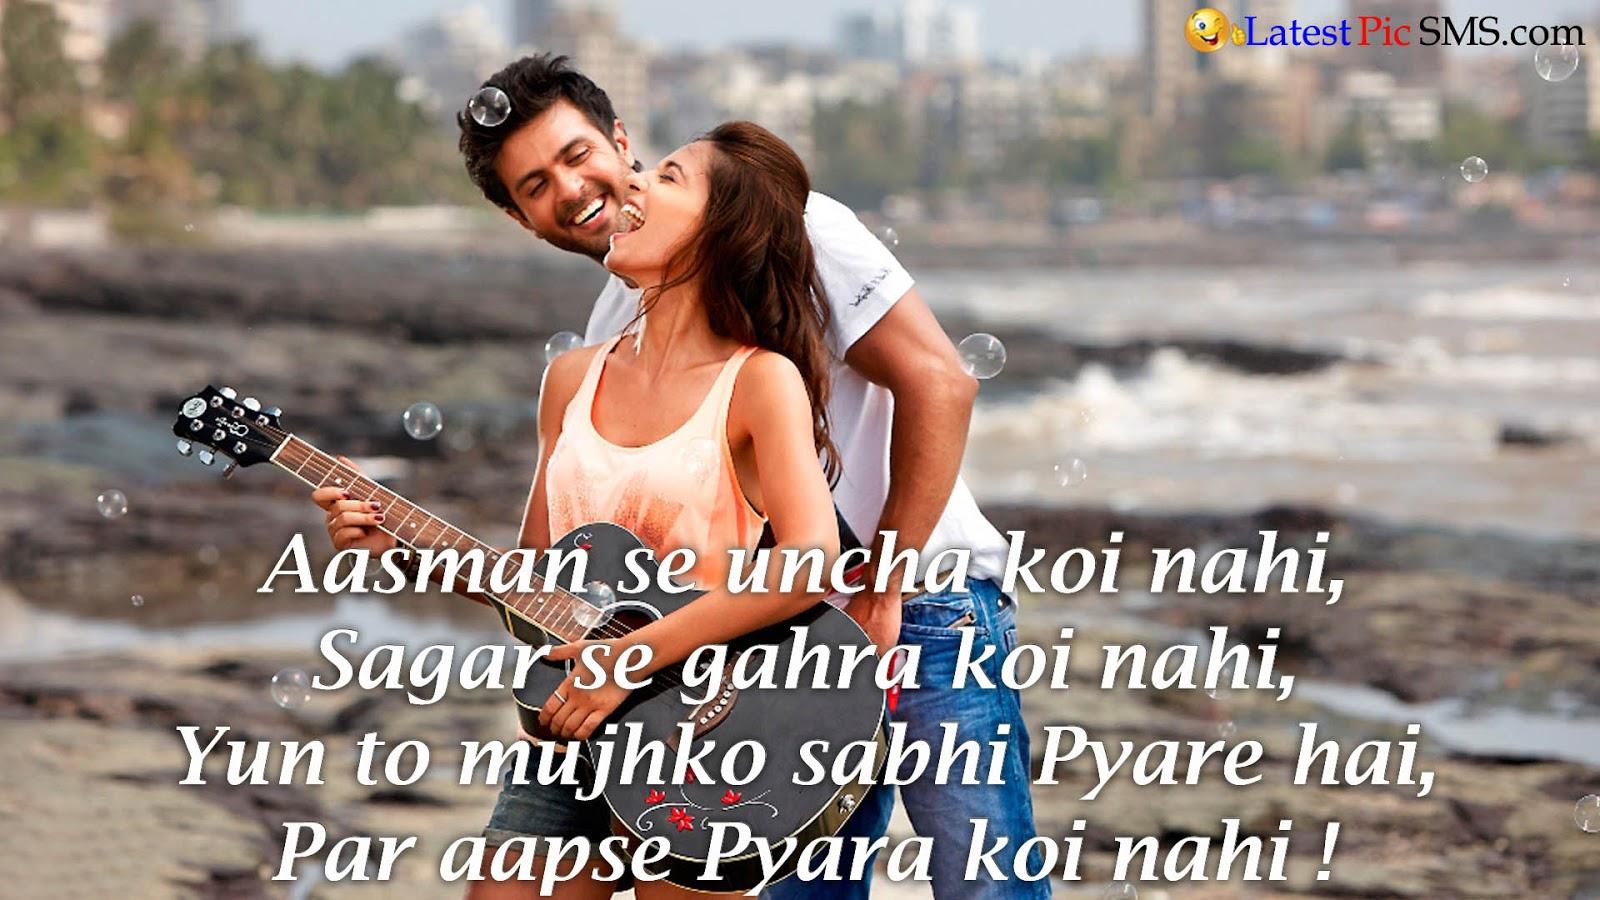 True Love Shayari Images In Hindi For Girlfriend